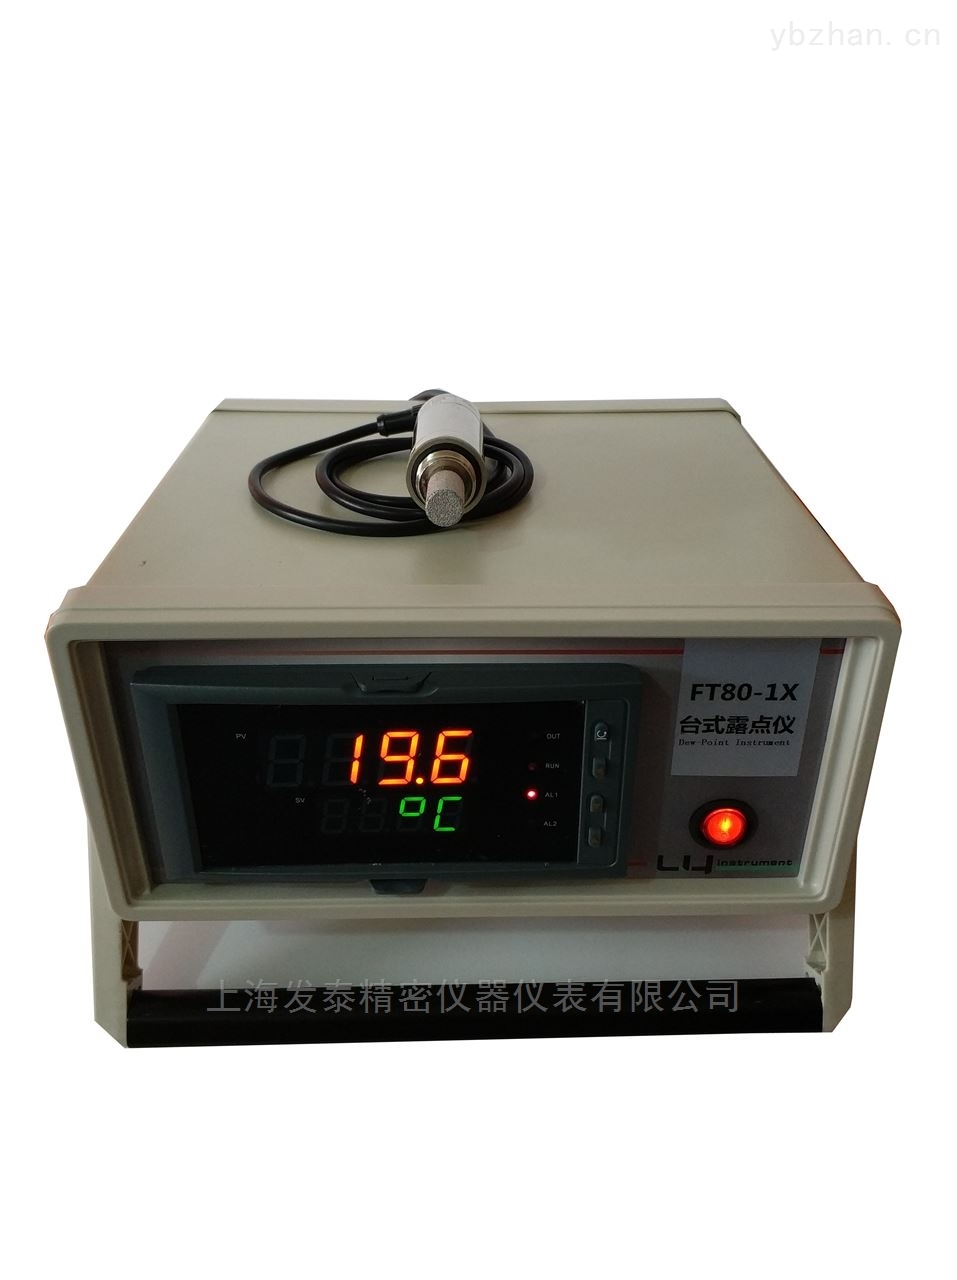 FT80-1X/FT80-2X-上海台式精密在线露点仪FT80-1X/FT80-2X